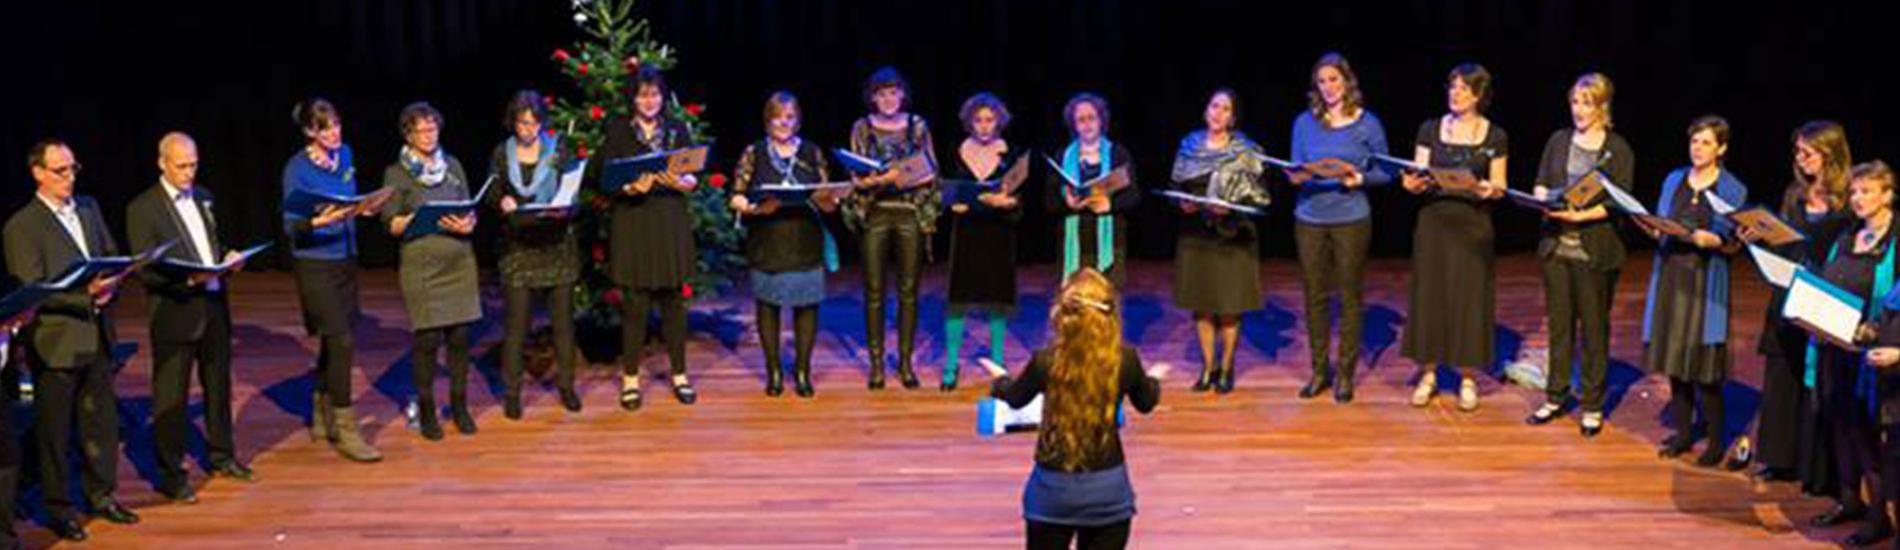 Vocaal Ensemble Korenbloem